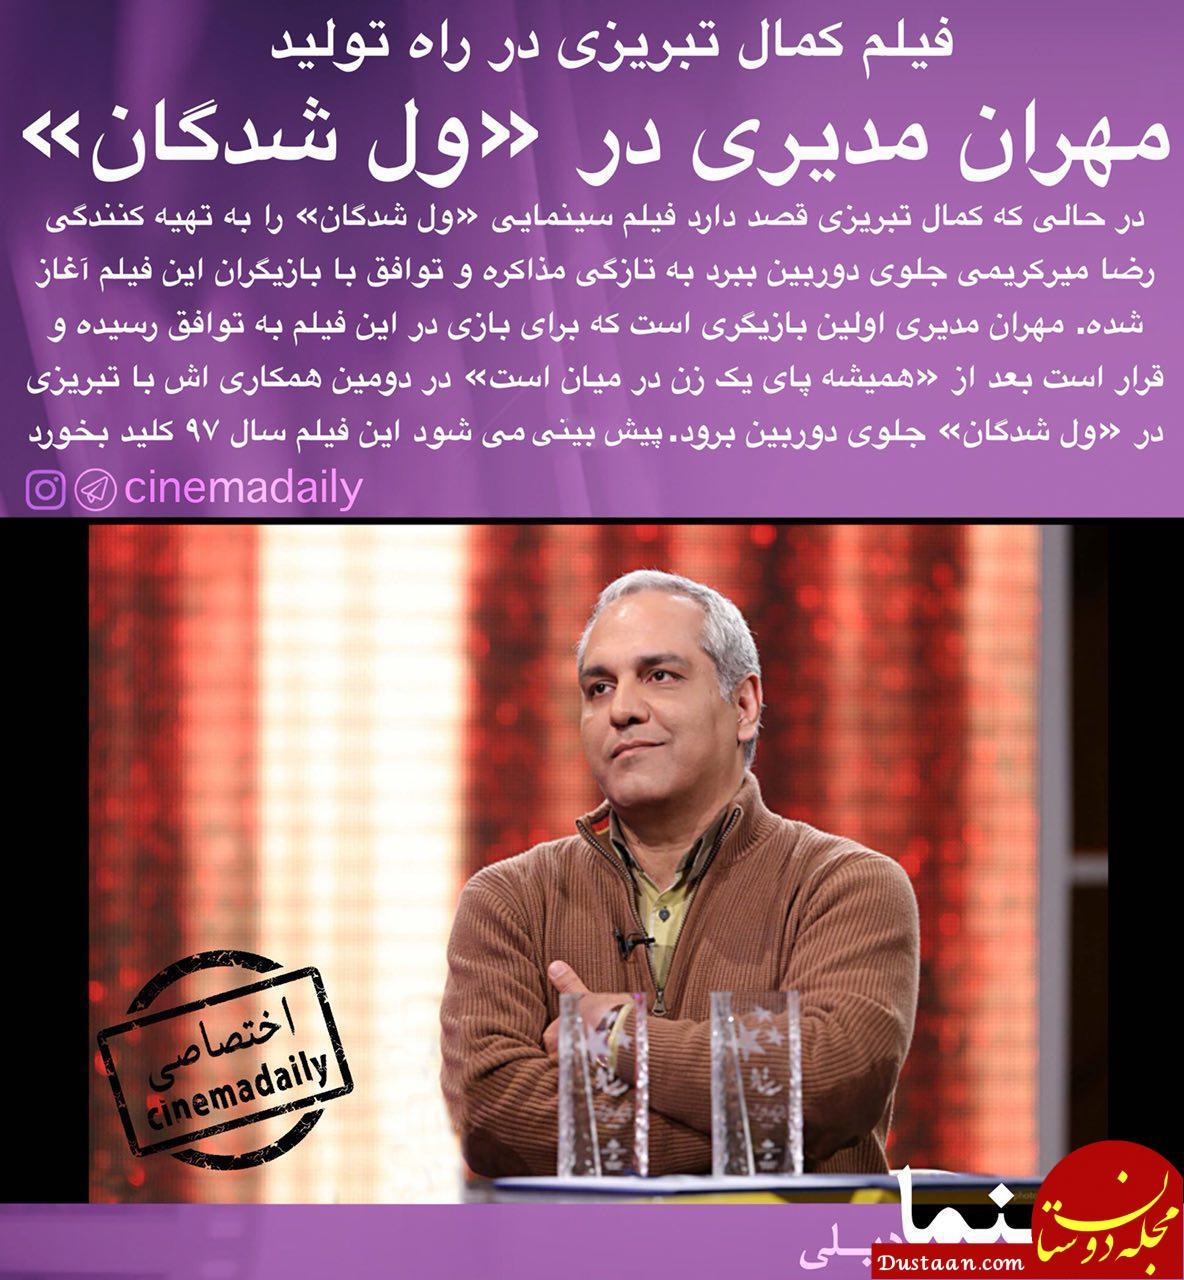 www.dustaan.com مهران مدیری بازیگر «ول شدگان» شد! +عکس